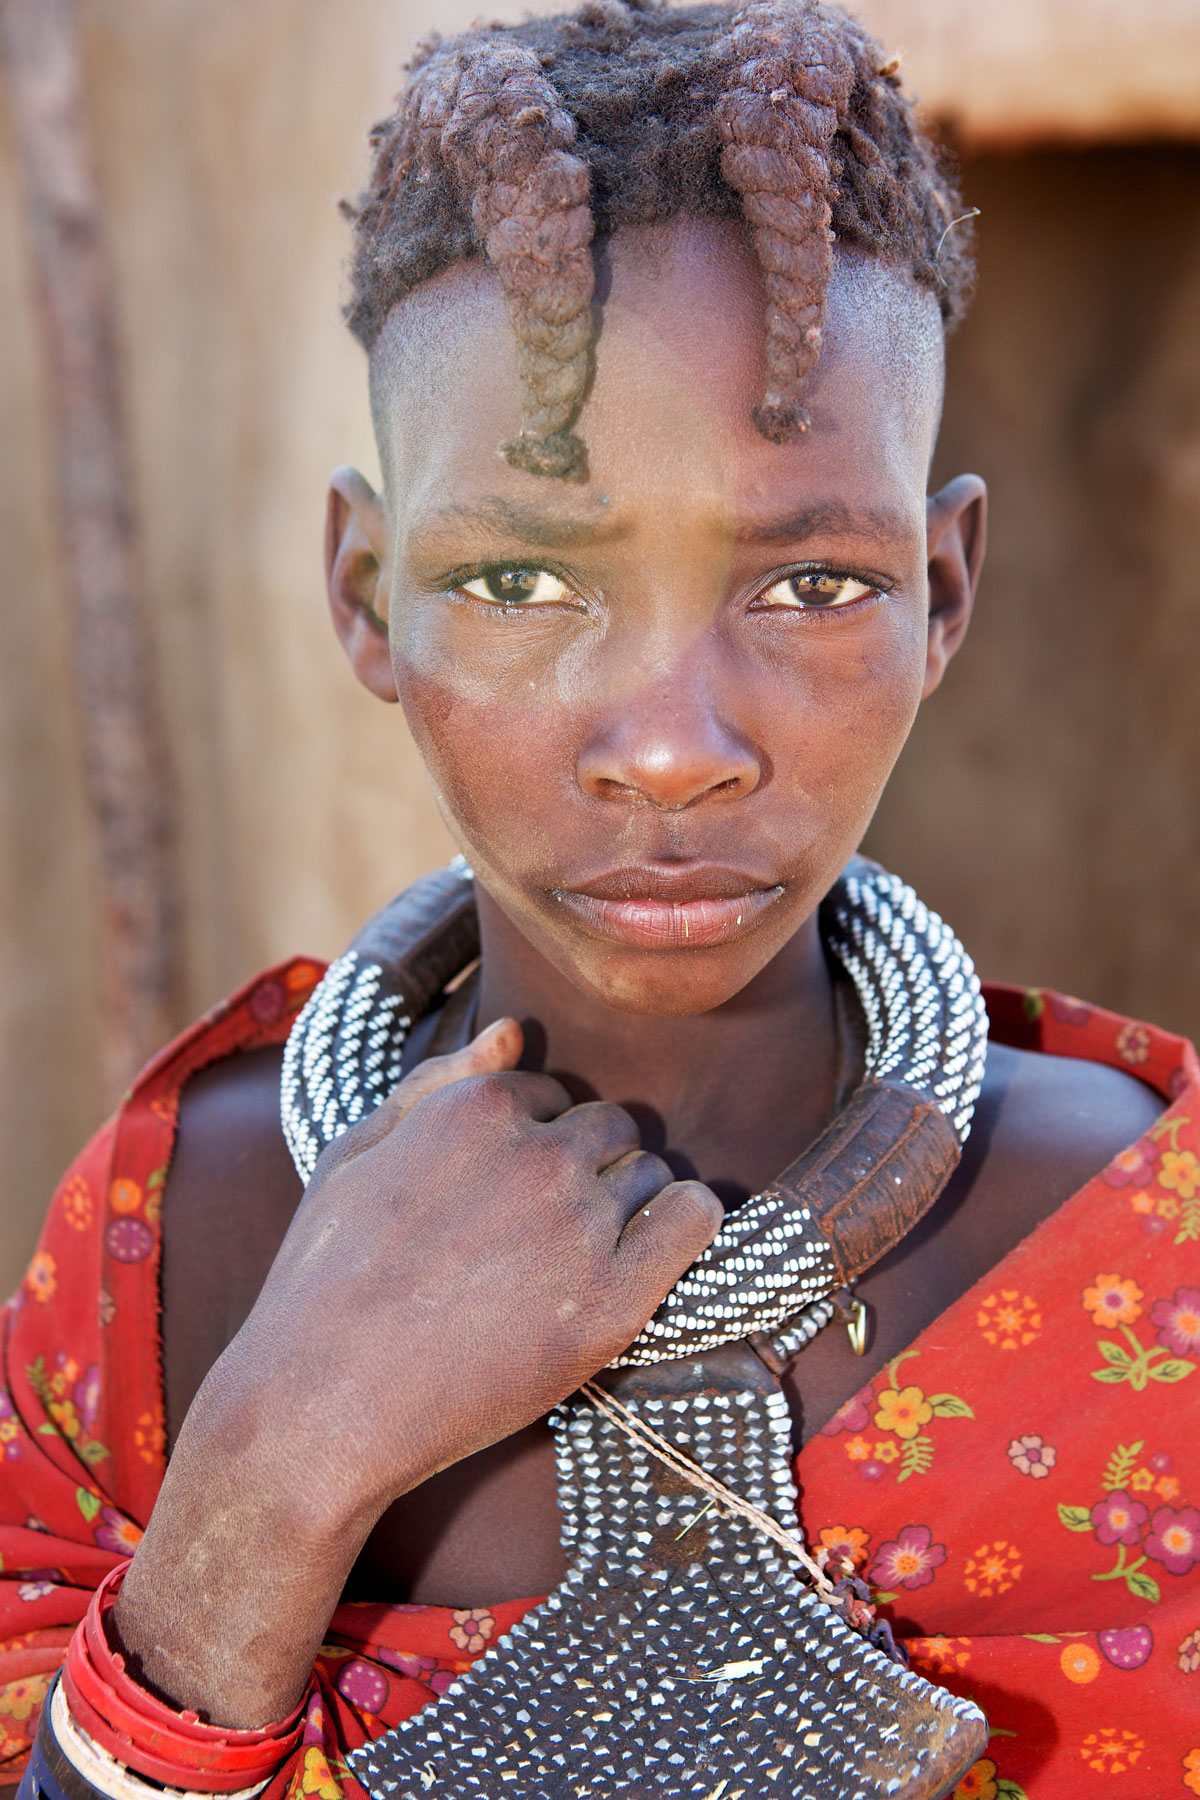 namibia_034_SP